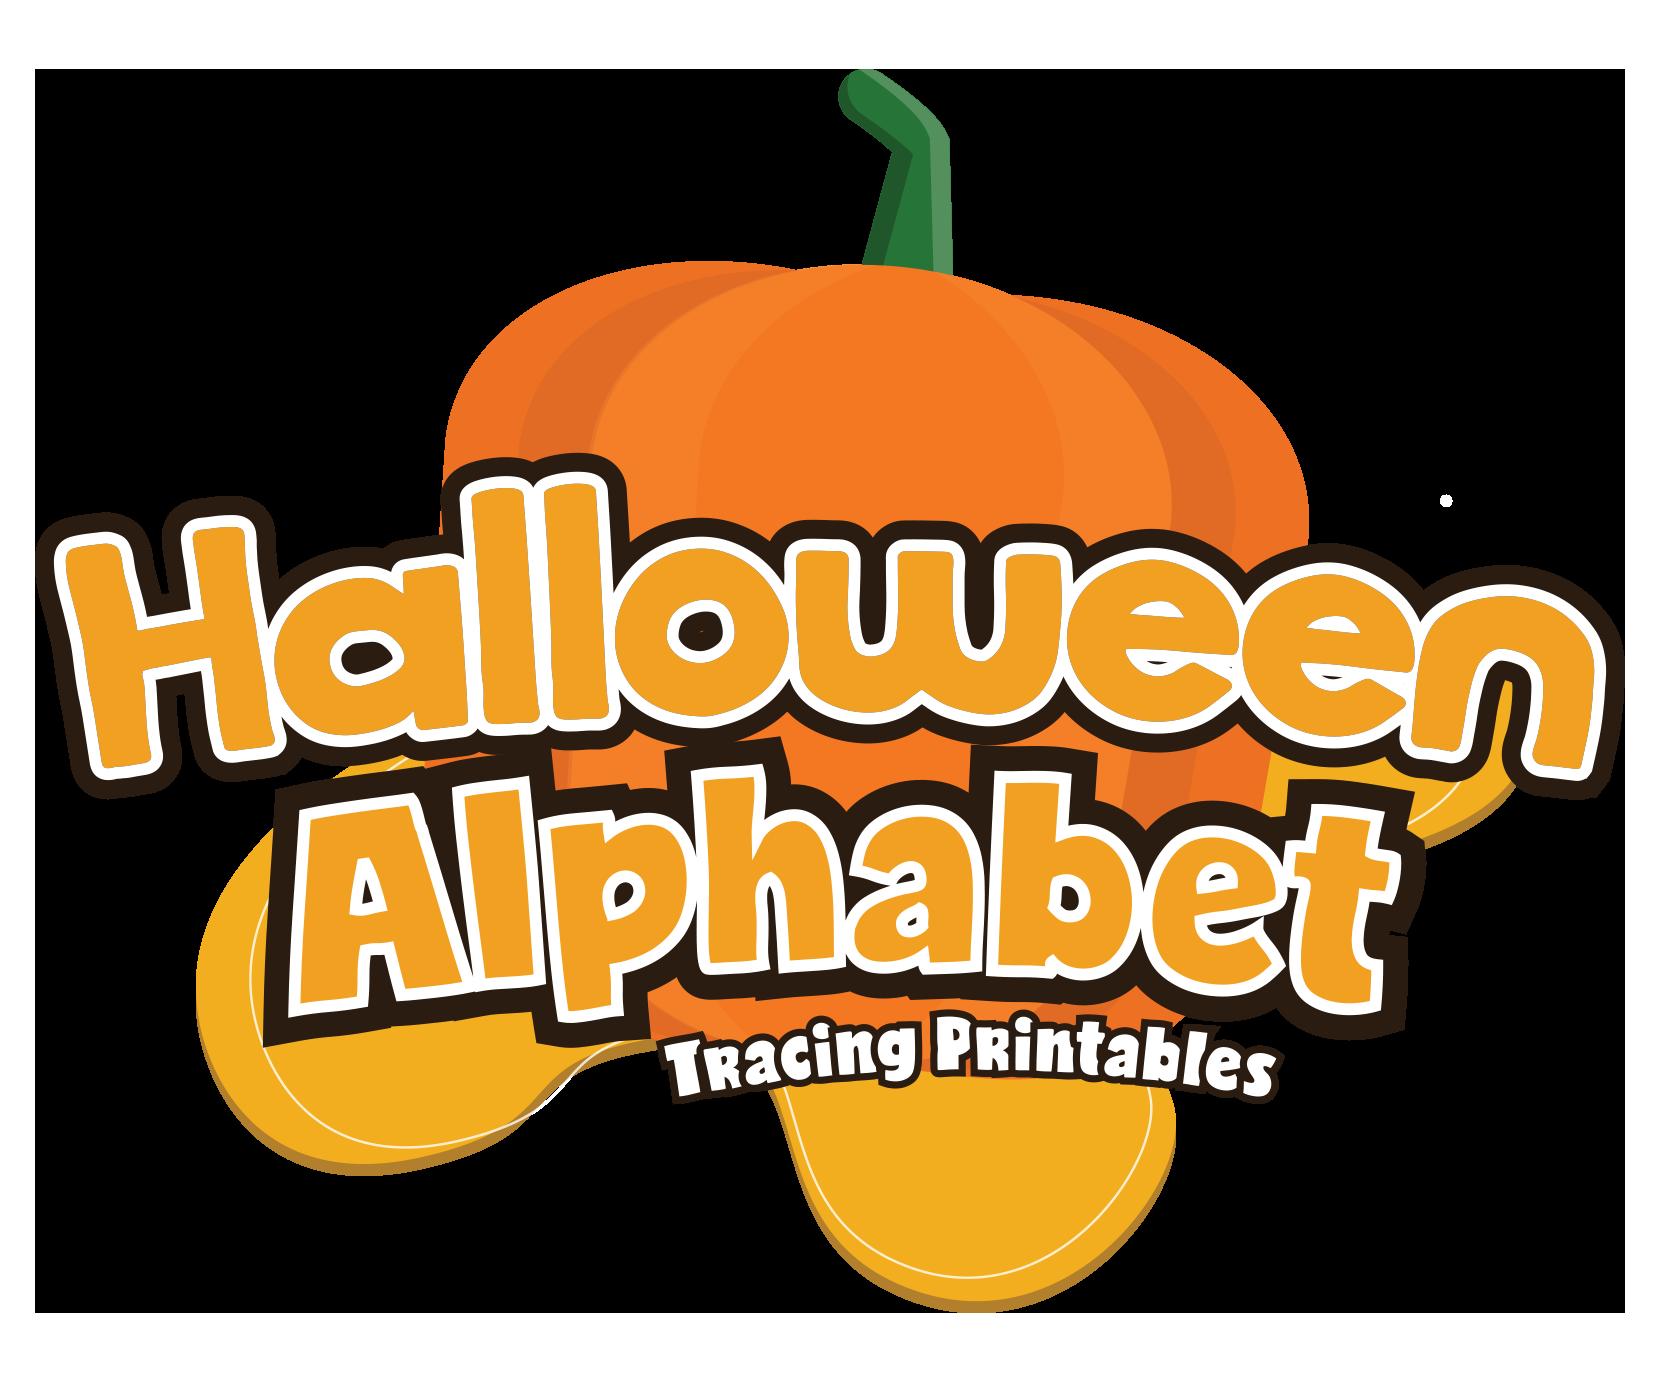 Halloween Alphabet Letter Tracing Pack For Preschoolers